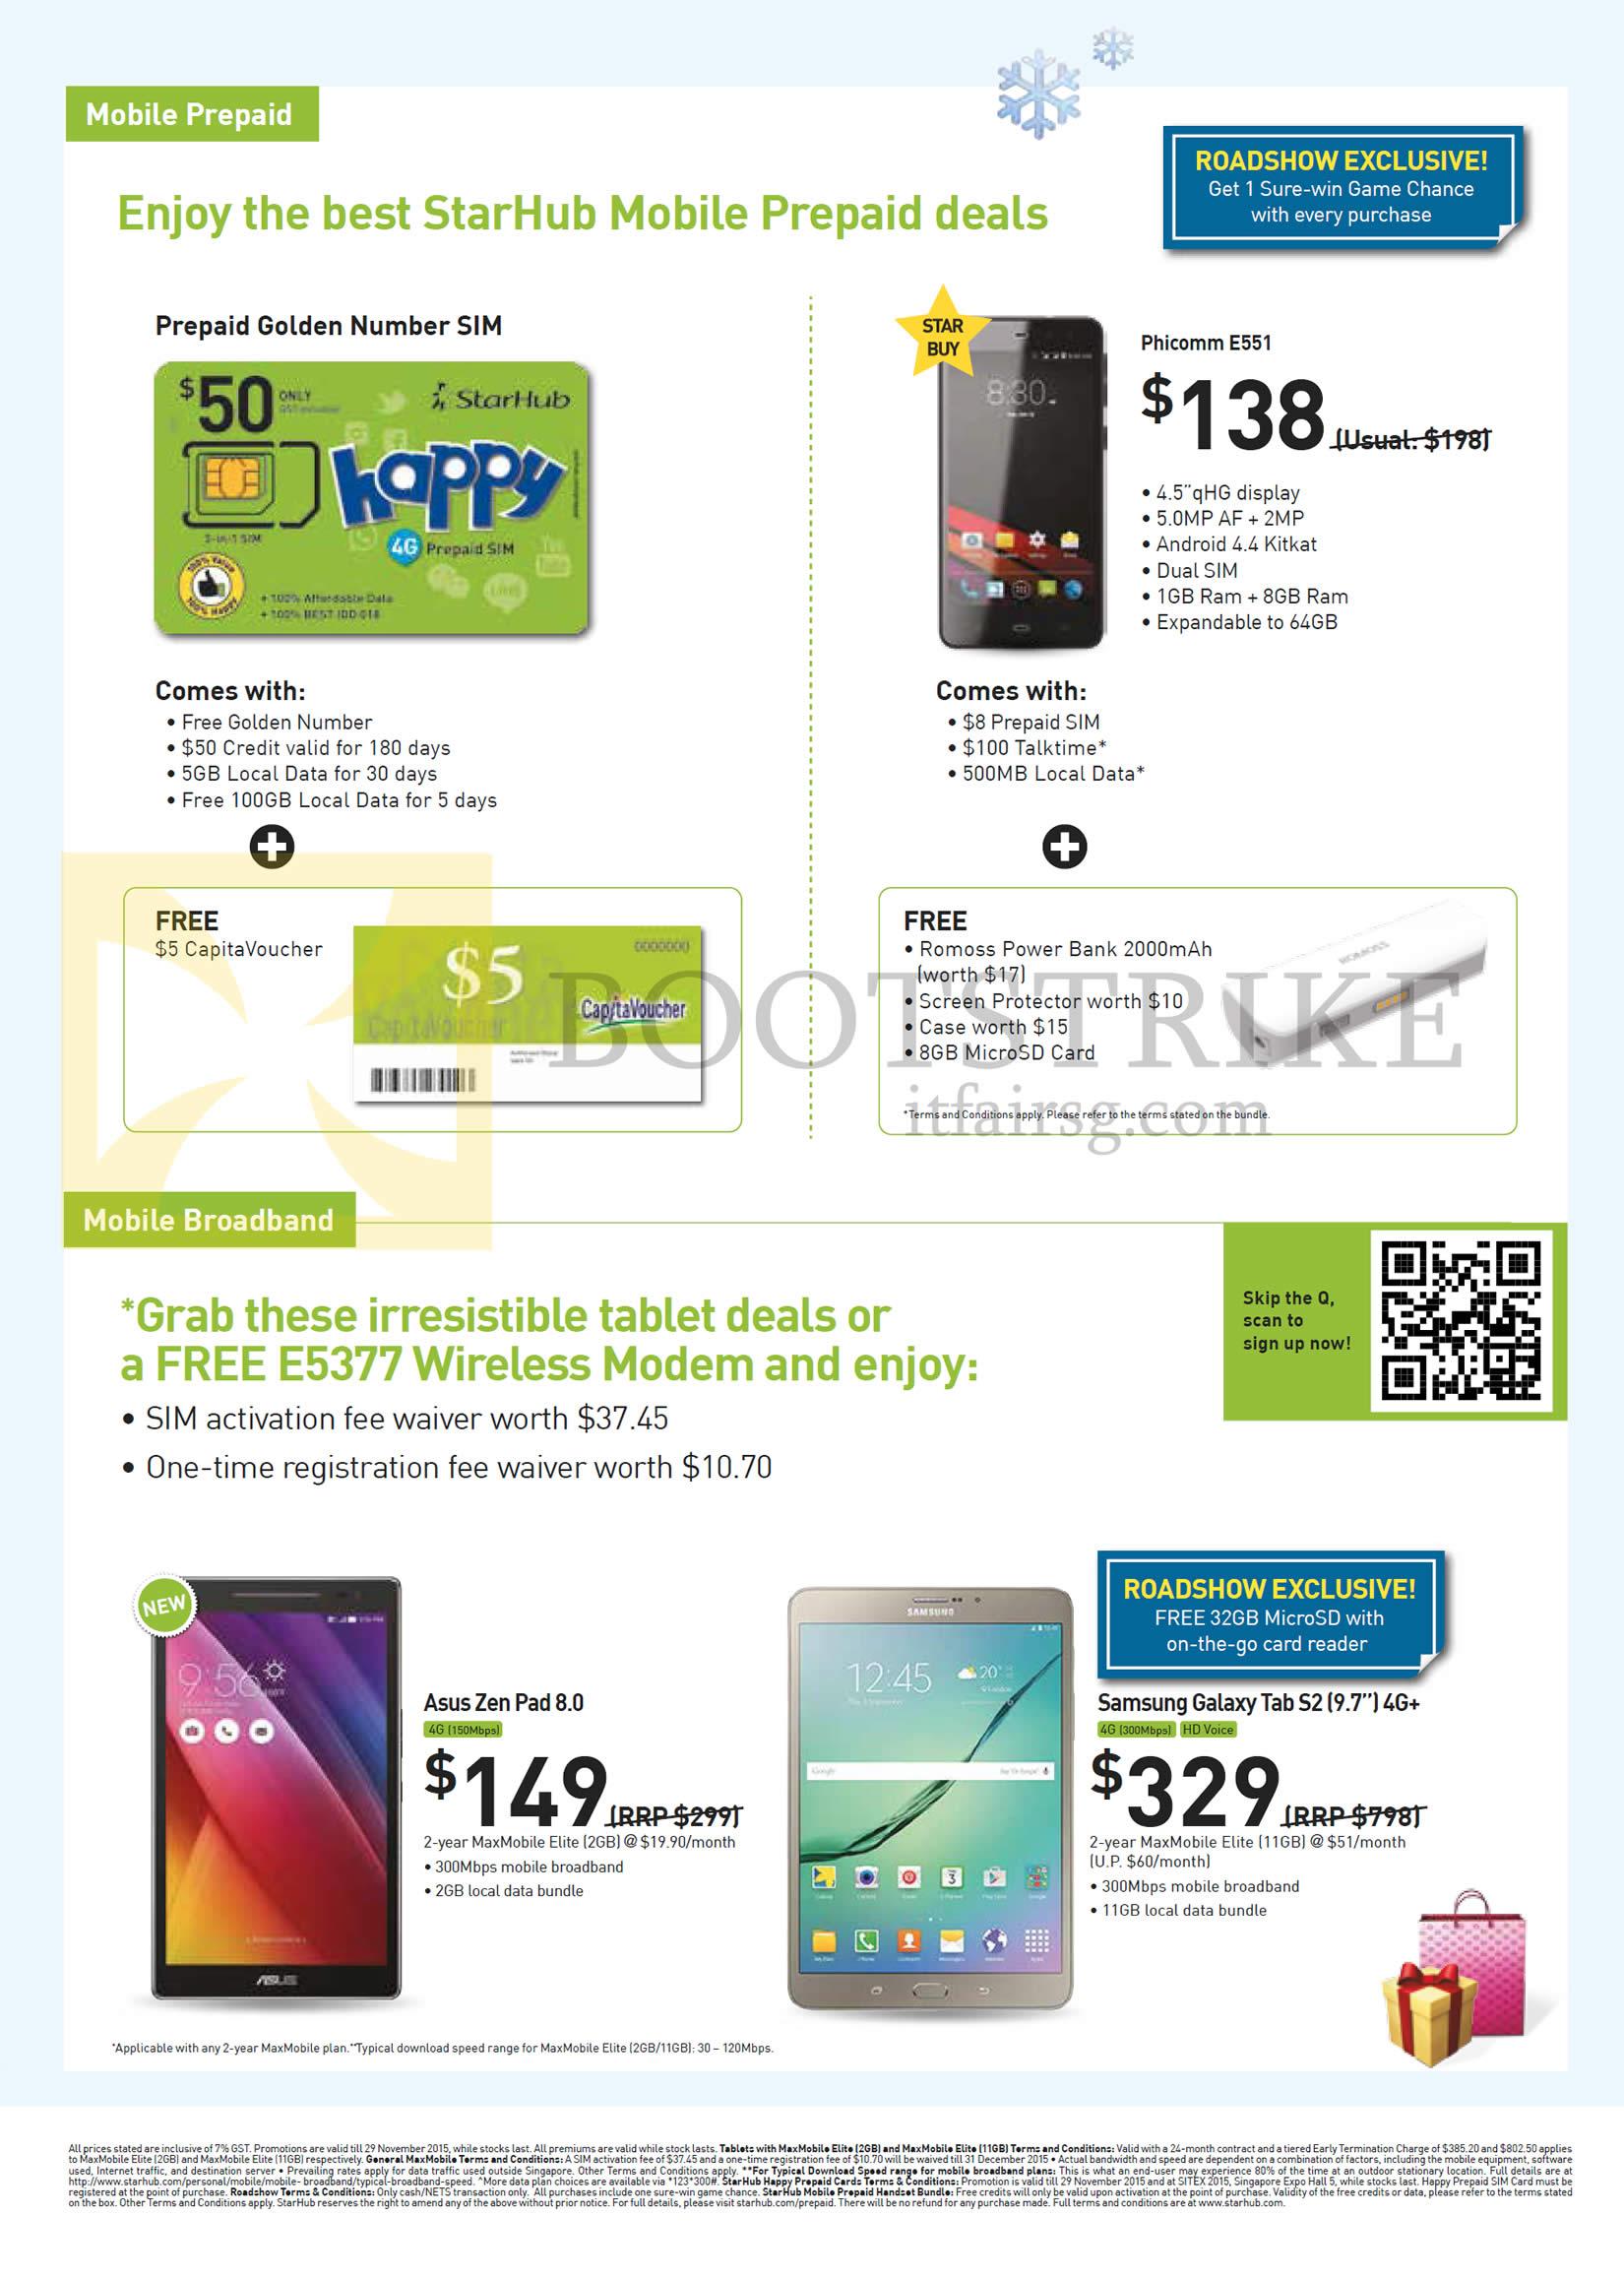 SITEX 2015 price list image brochure of Starhub Mobile Prepaid, Broadband, Golden Number Sim, Phicomm E551, Asus Zenpad 8.0, Samsung Galaxy Tab S2 9.7